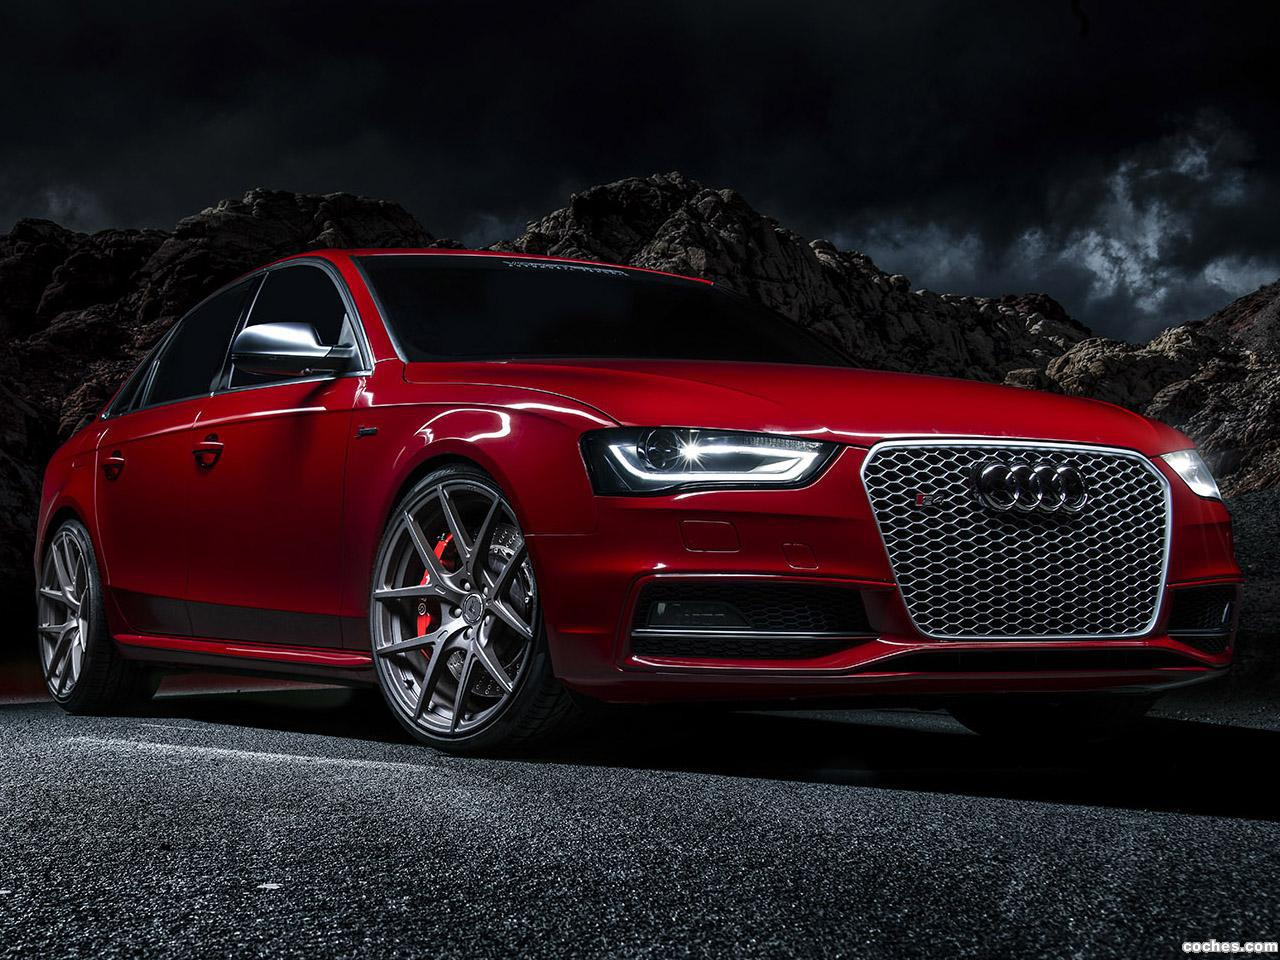 Foto 0 de Vorsteiner Audi S4 Sedan 2013